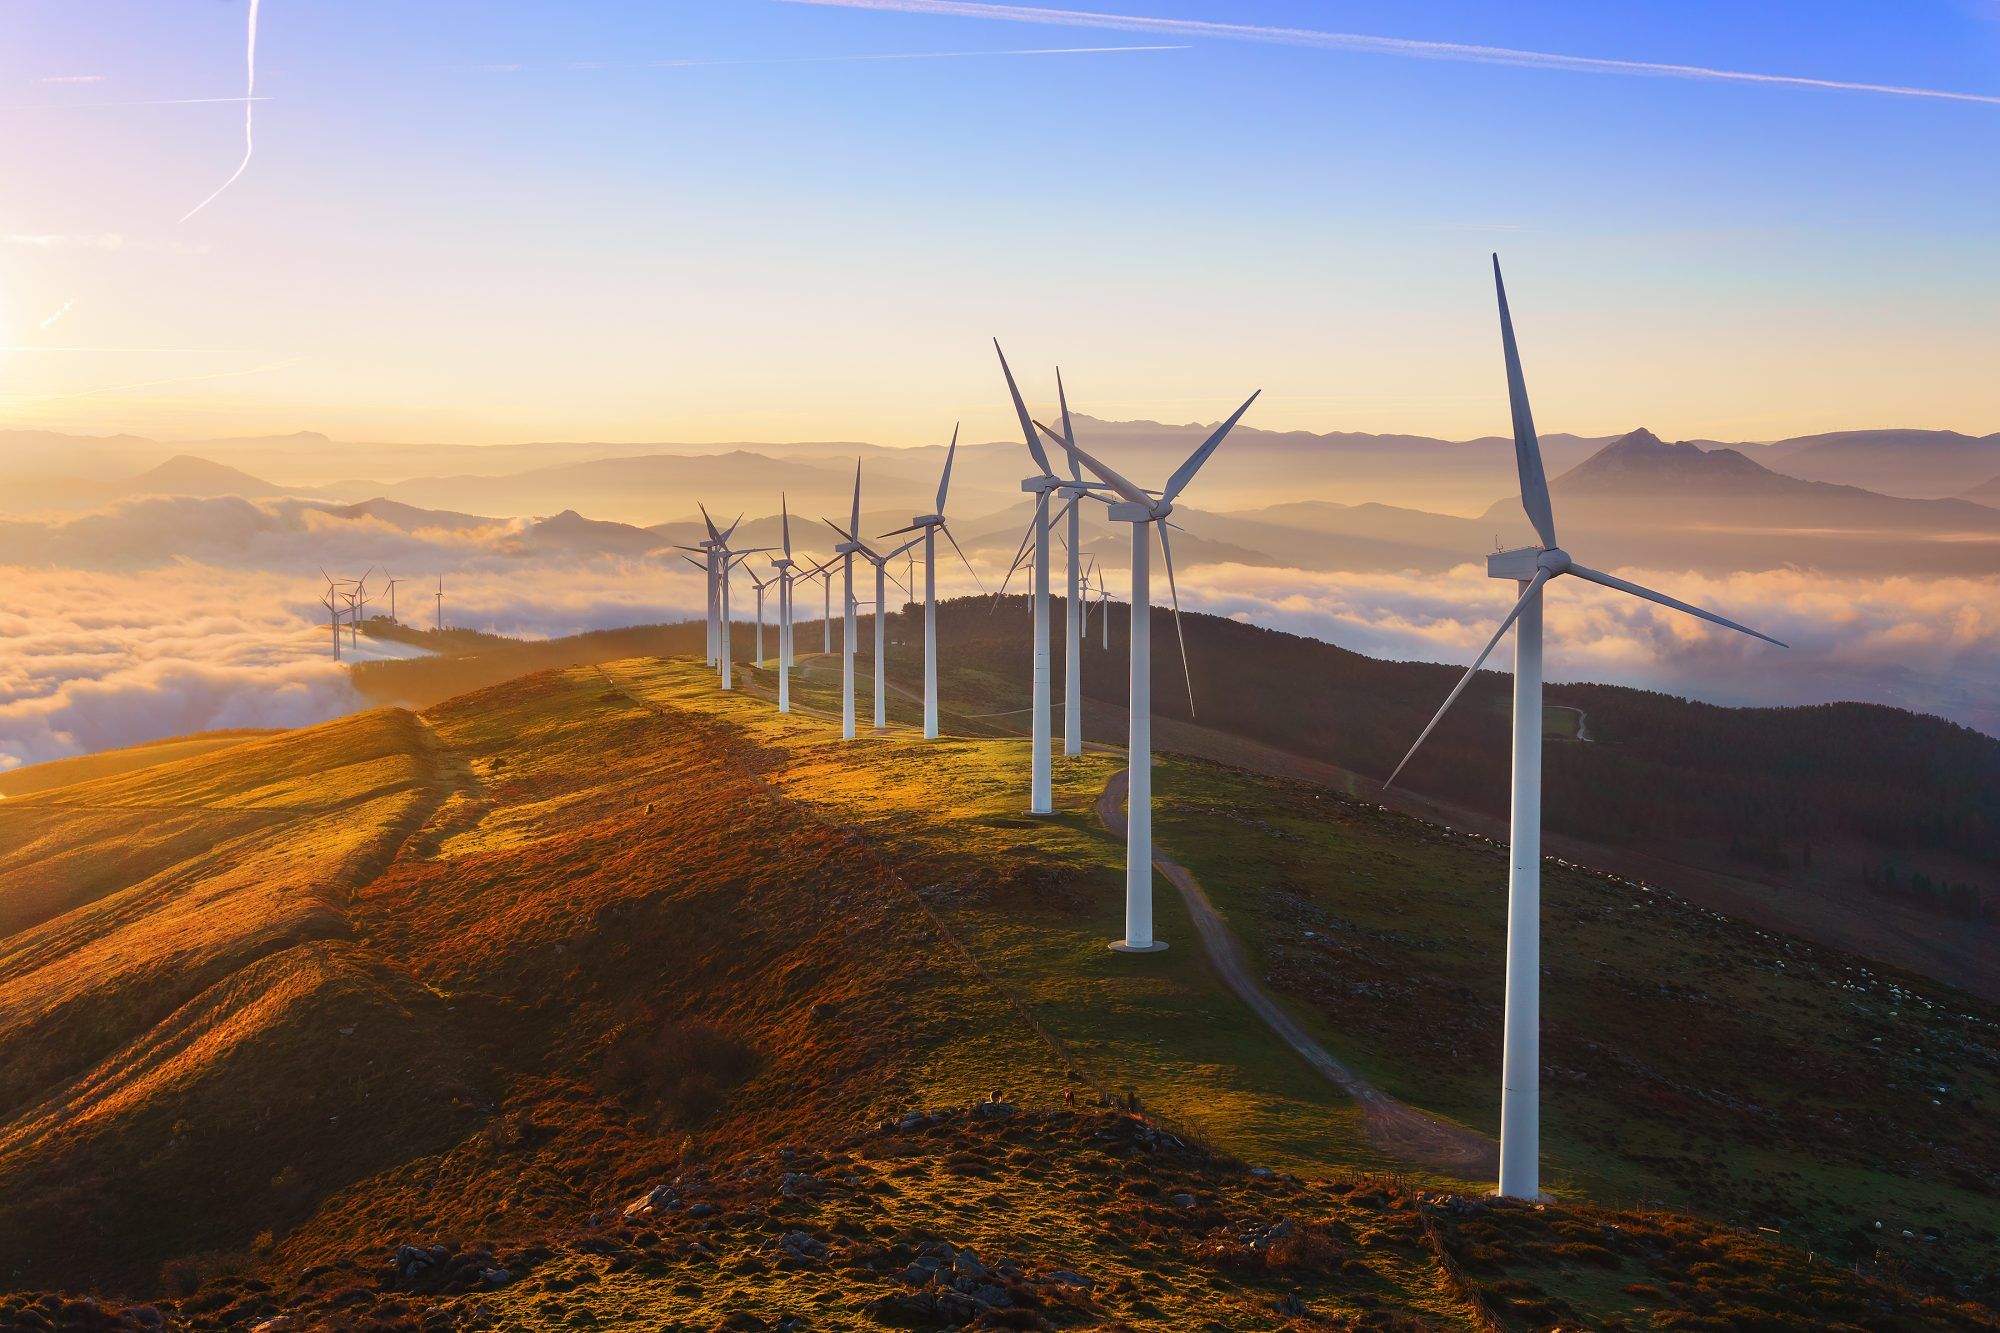 Wind turbine landscape image